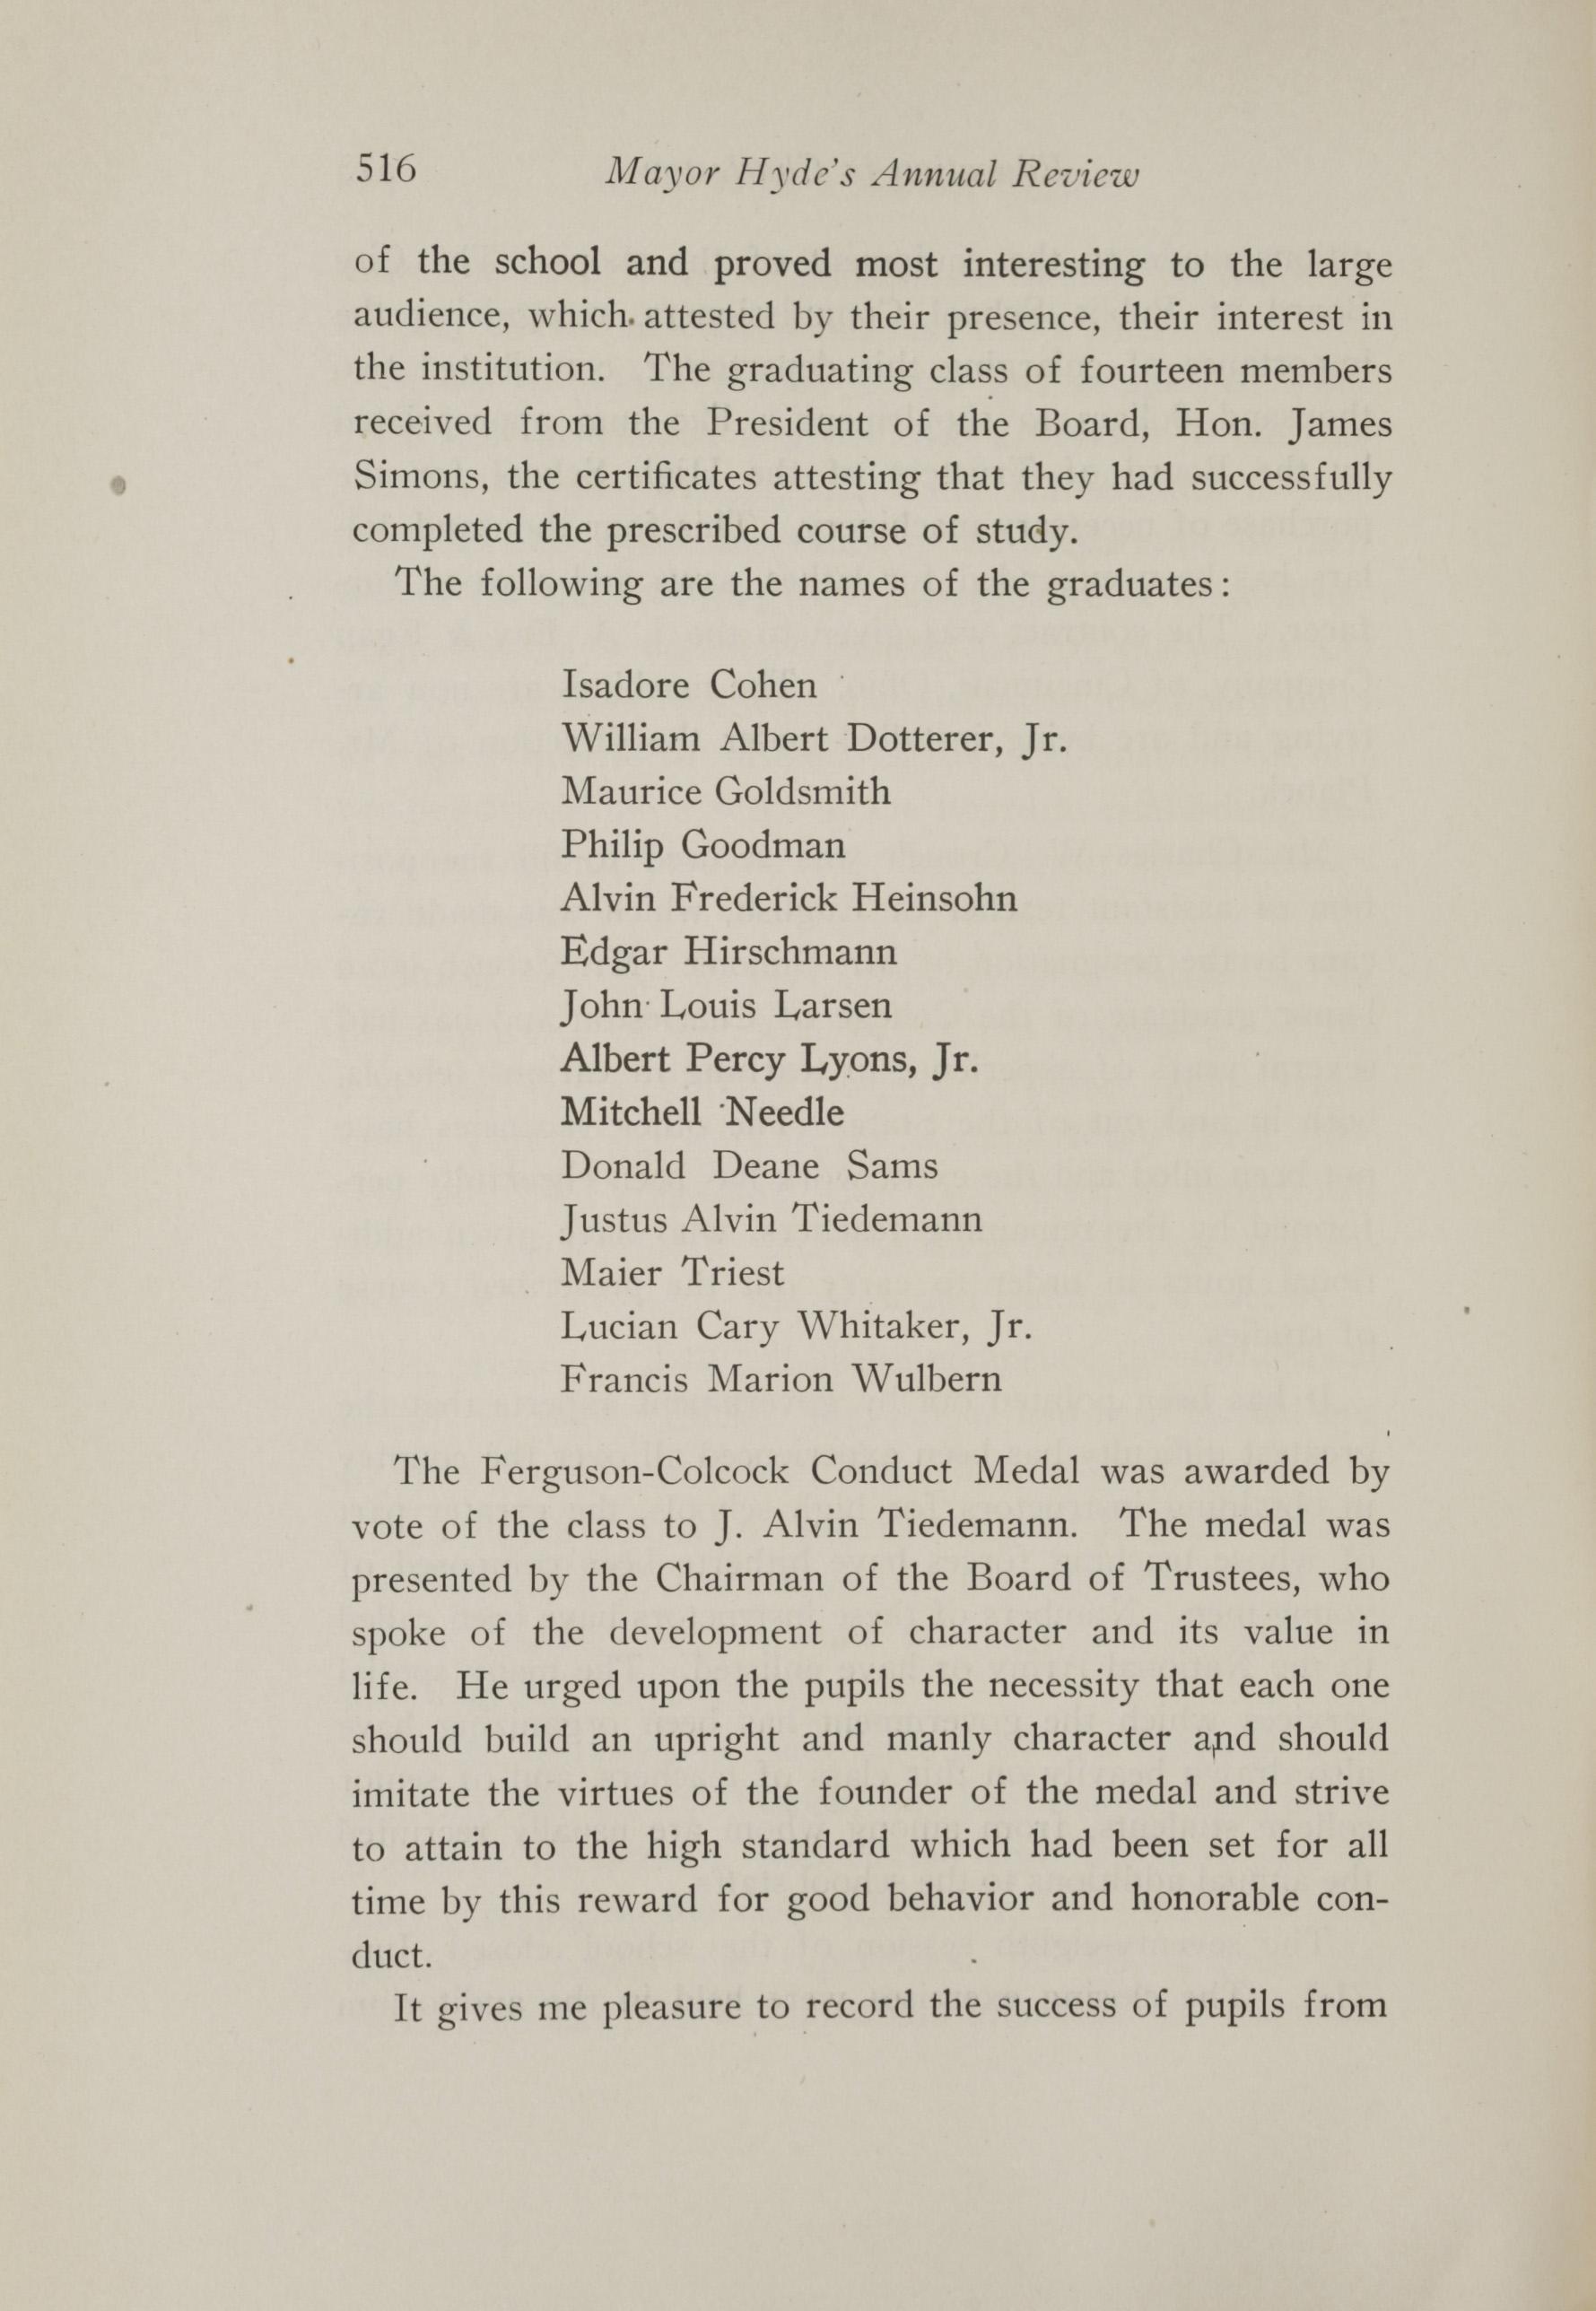 Charleston Yearbook, 1917, page 516